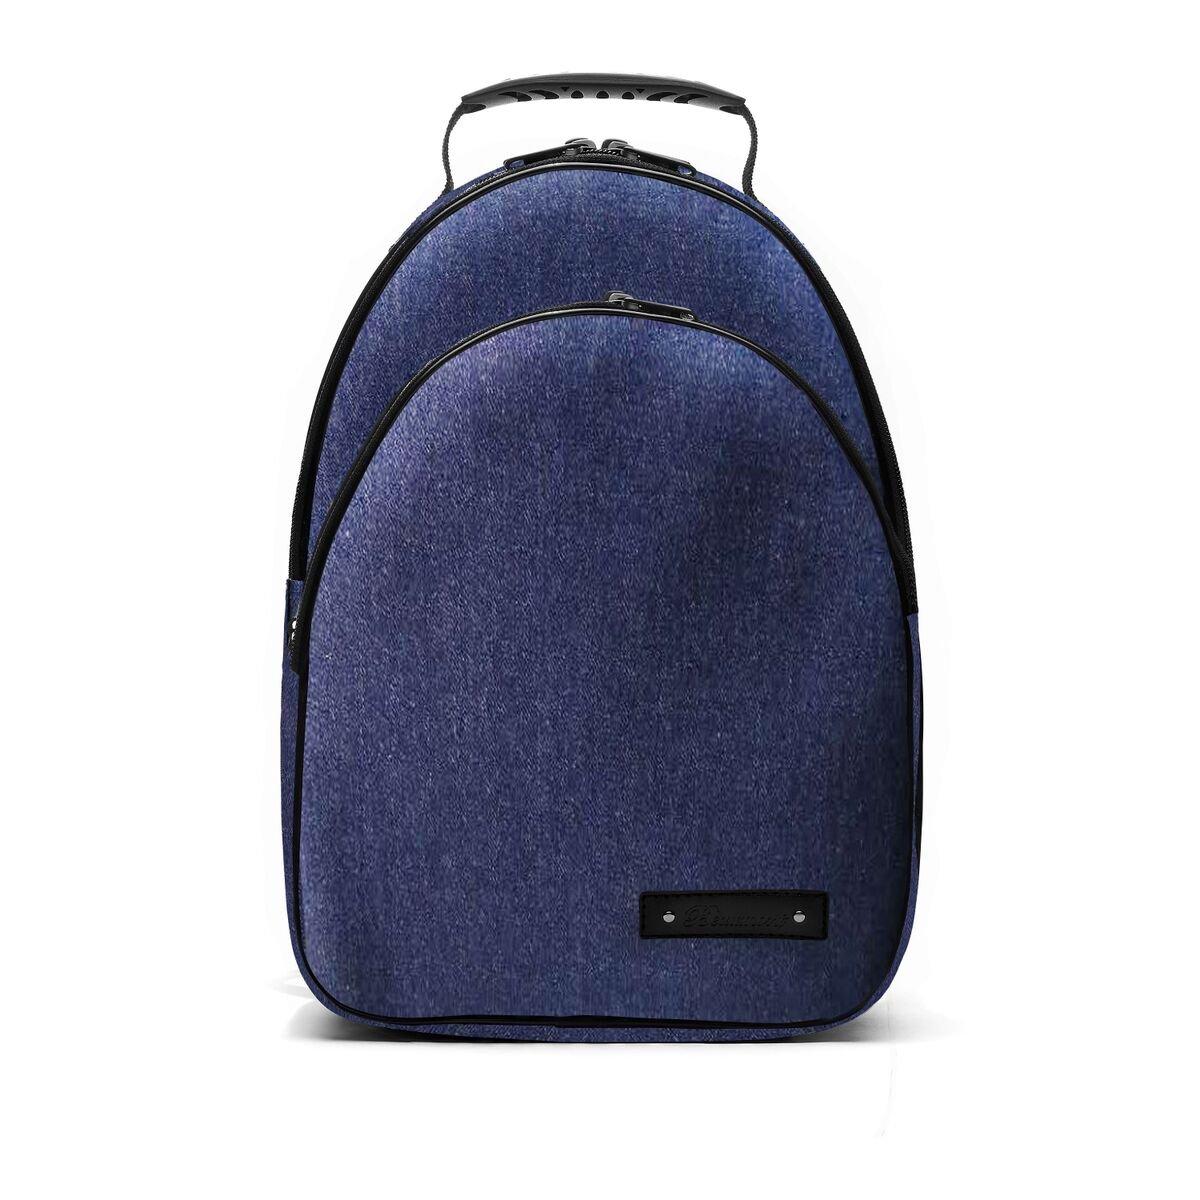 Clarinet Case Backpack - Handmade Beaumont Student Bb Clarinet Bag - Blue Denim